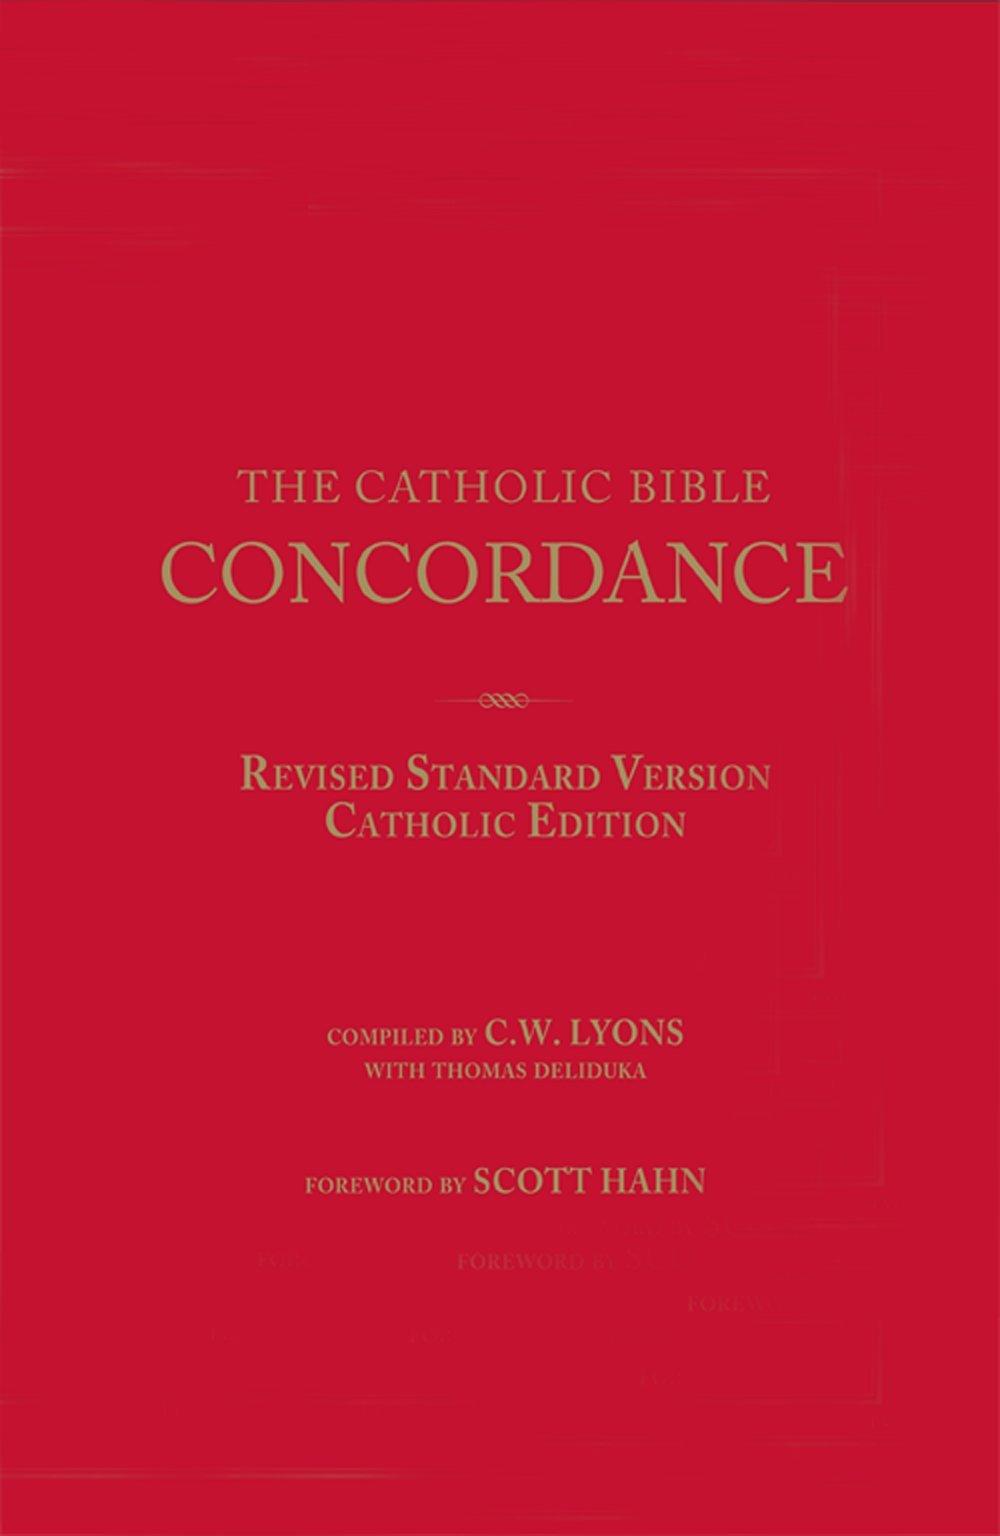 The Catholic Bible Concordance For Revised Standard Version Edition Rsv Ce C W Lyon Thoma Deliduka Scott Hahn 9781931018494 Amazon Com Books New Pdf Free Download